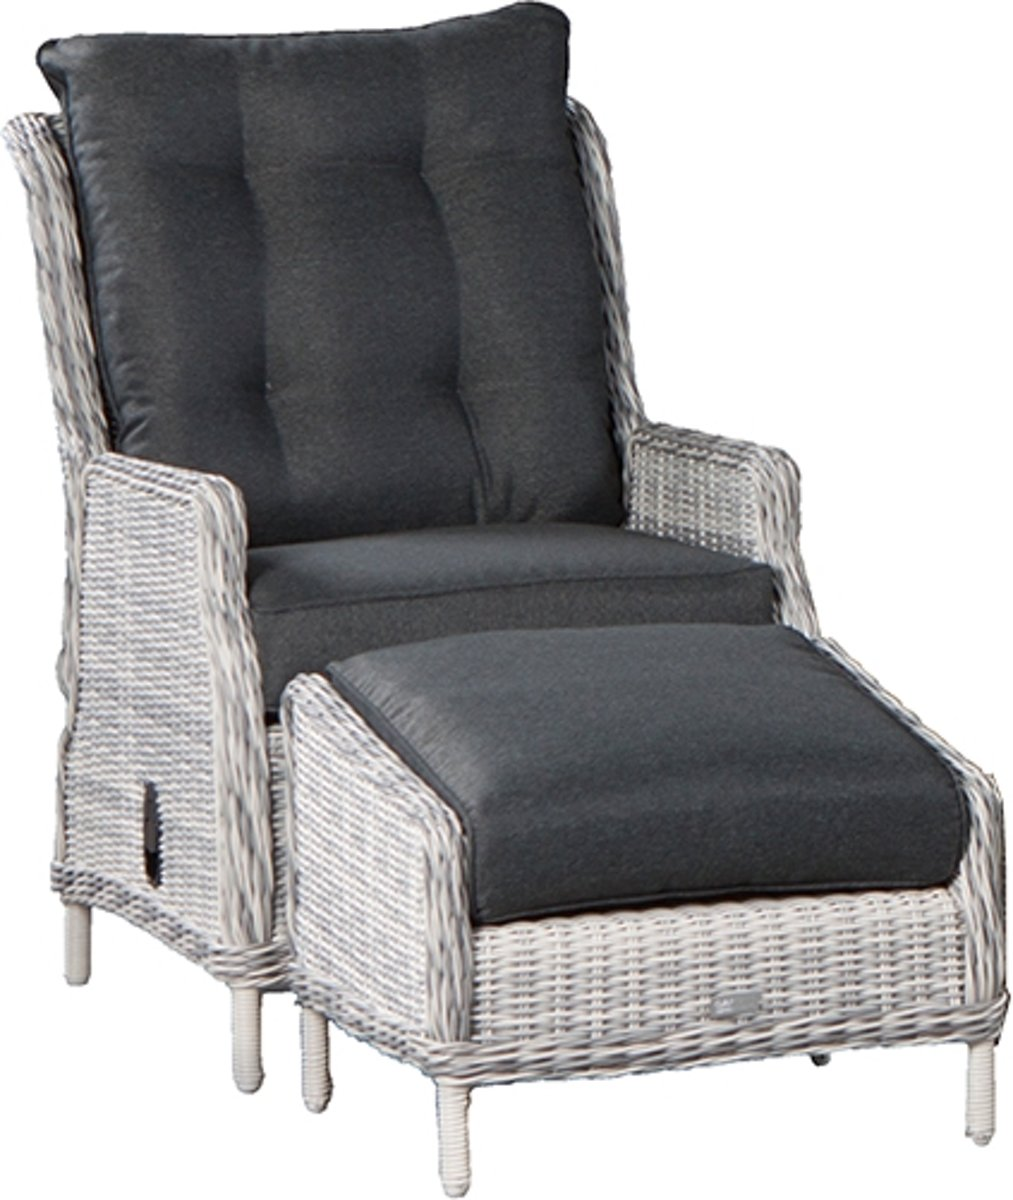 Lekkere Lounge Stoel.Bol Com Loungestoel Kopen Alle Loungestoelen Online